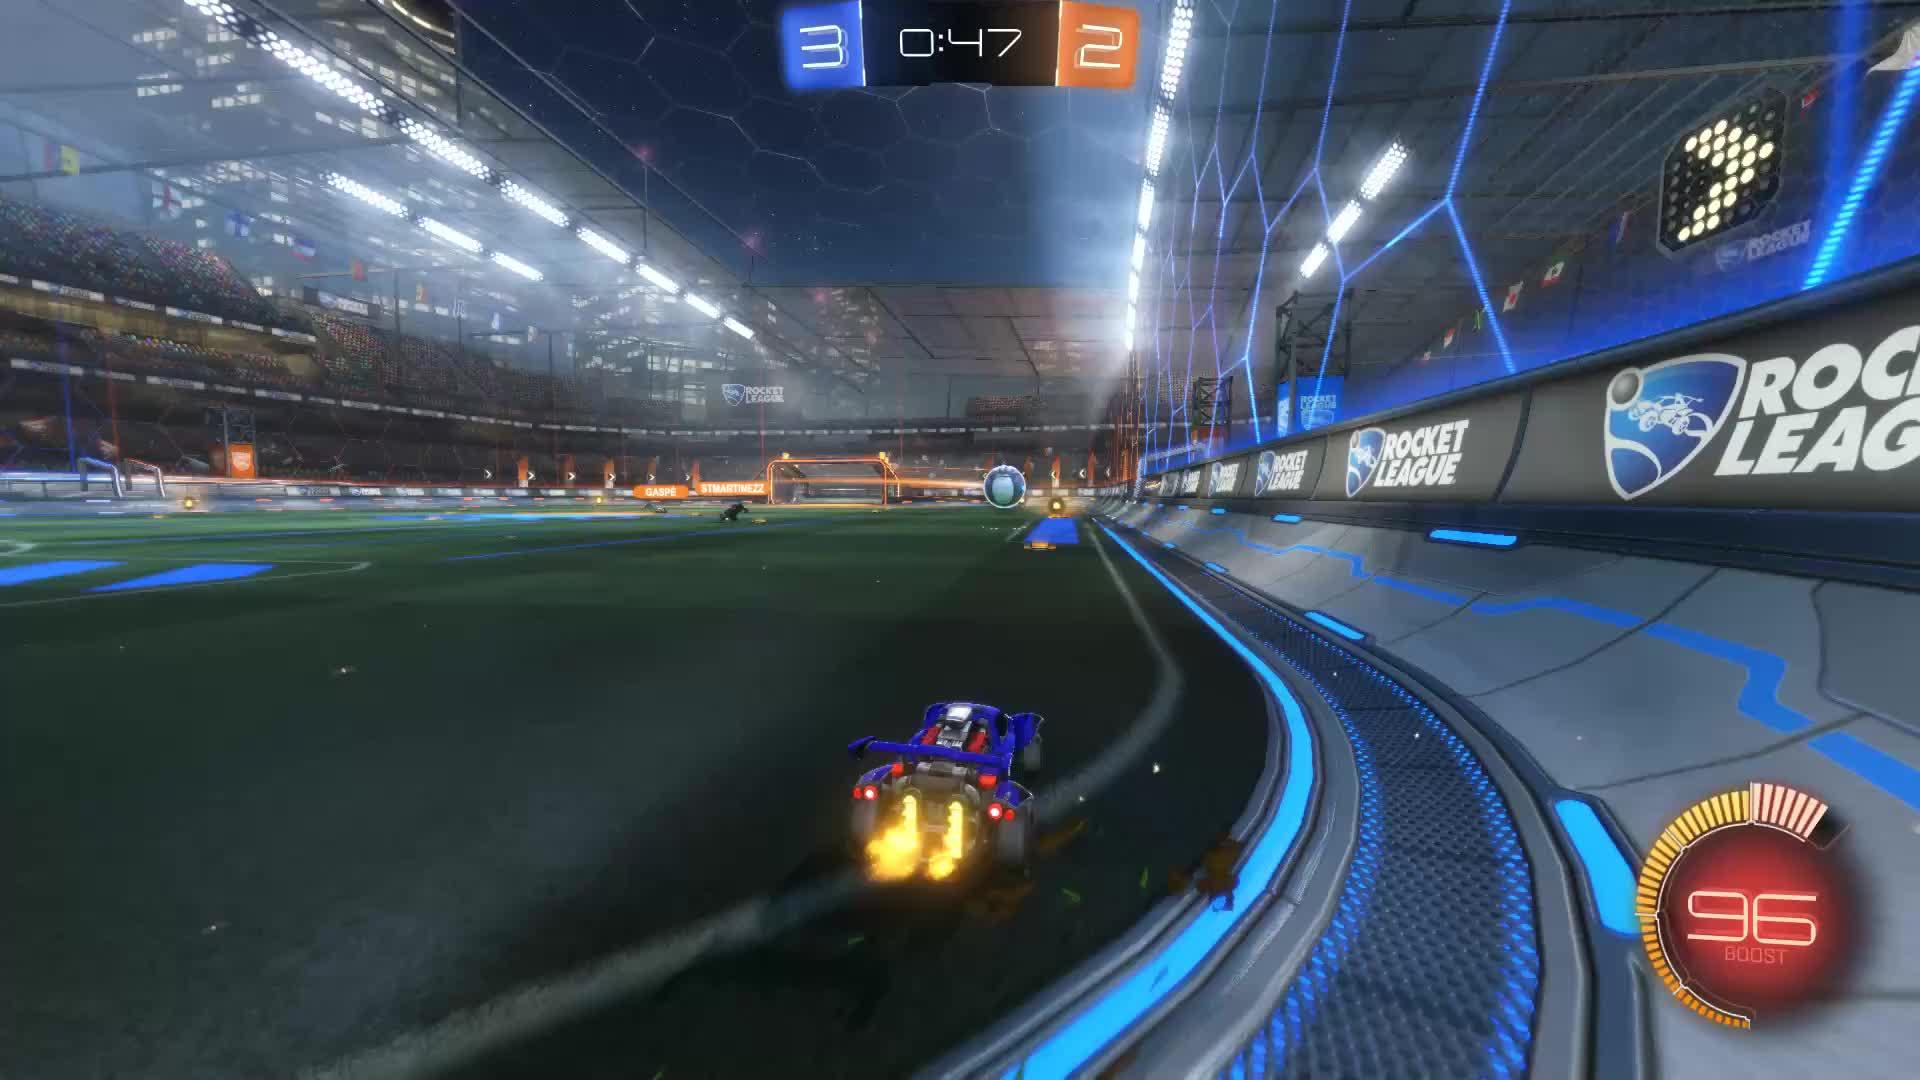 Fuck, Gif Your Game, GifYourGame, Goal, Rocket League, RocketLeague, Goal 6: Fuck GIFs